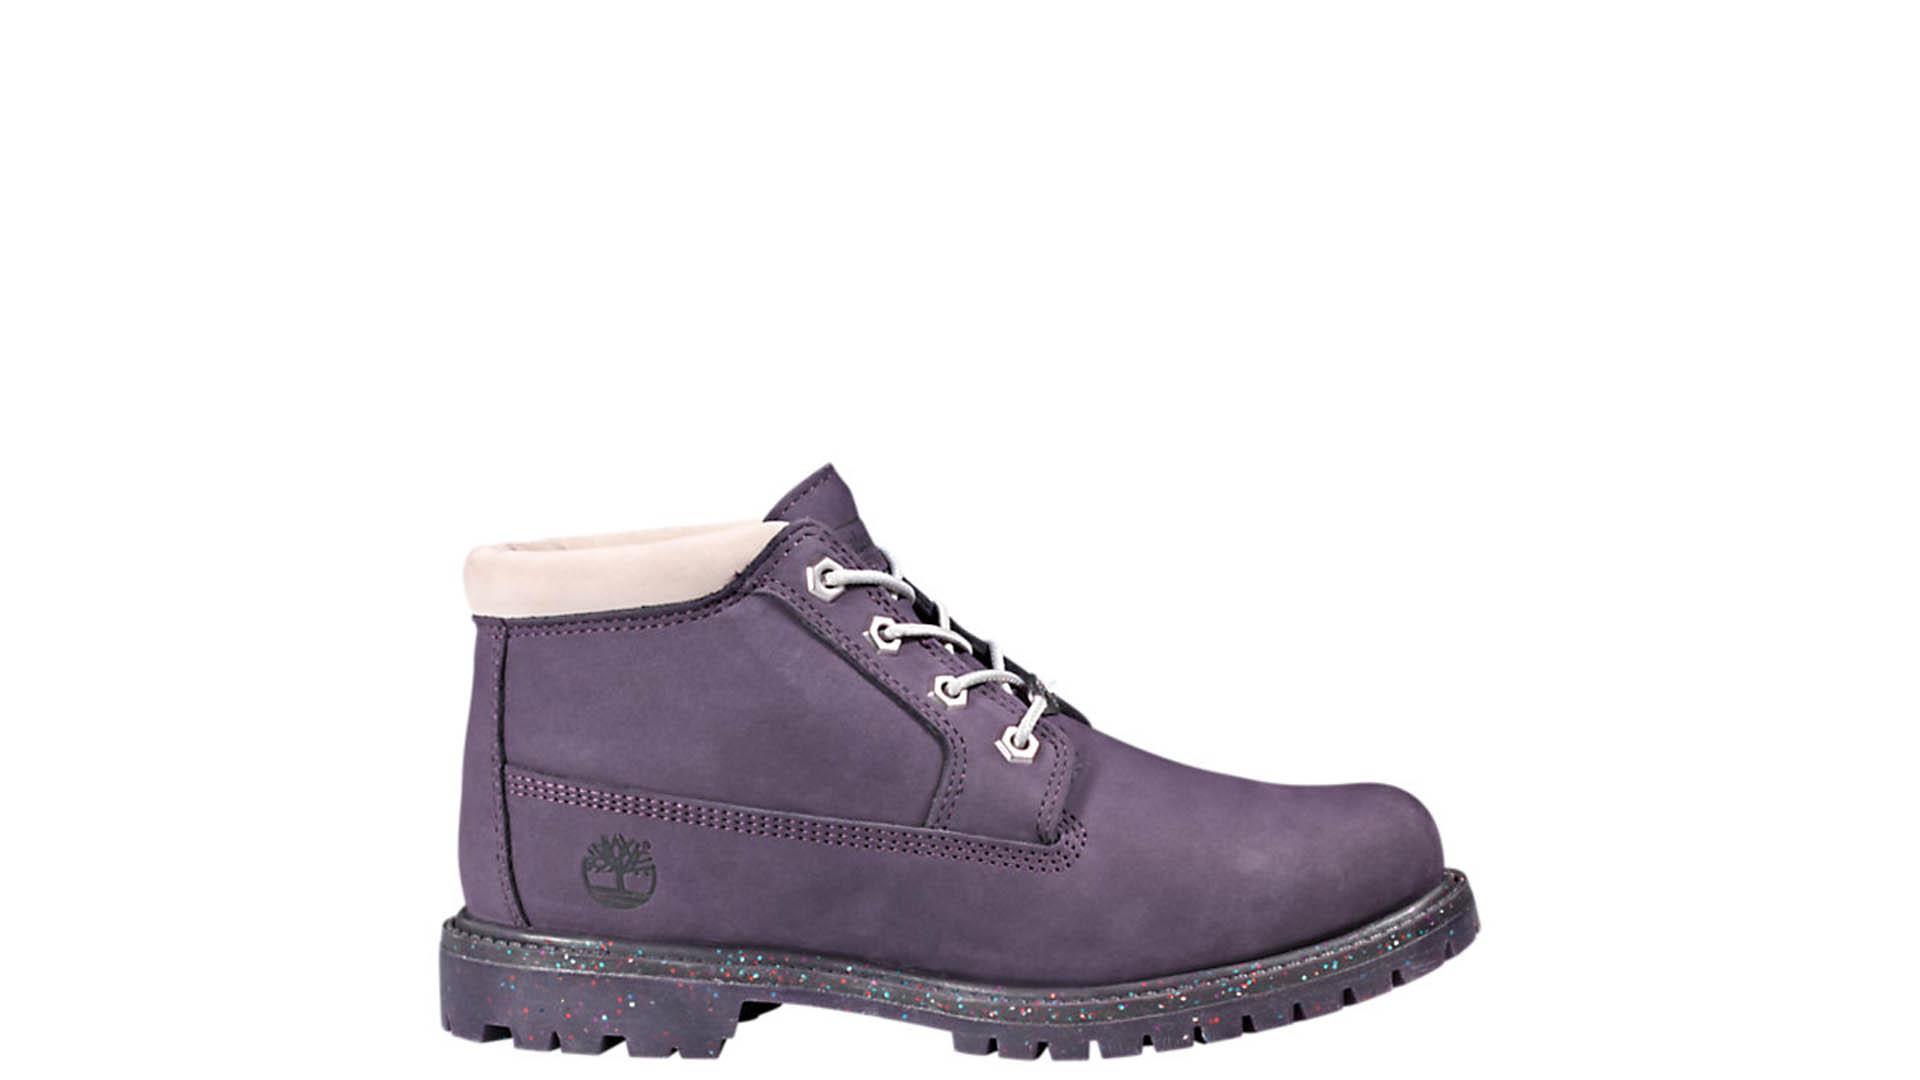 memorial day work boot sale